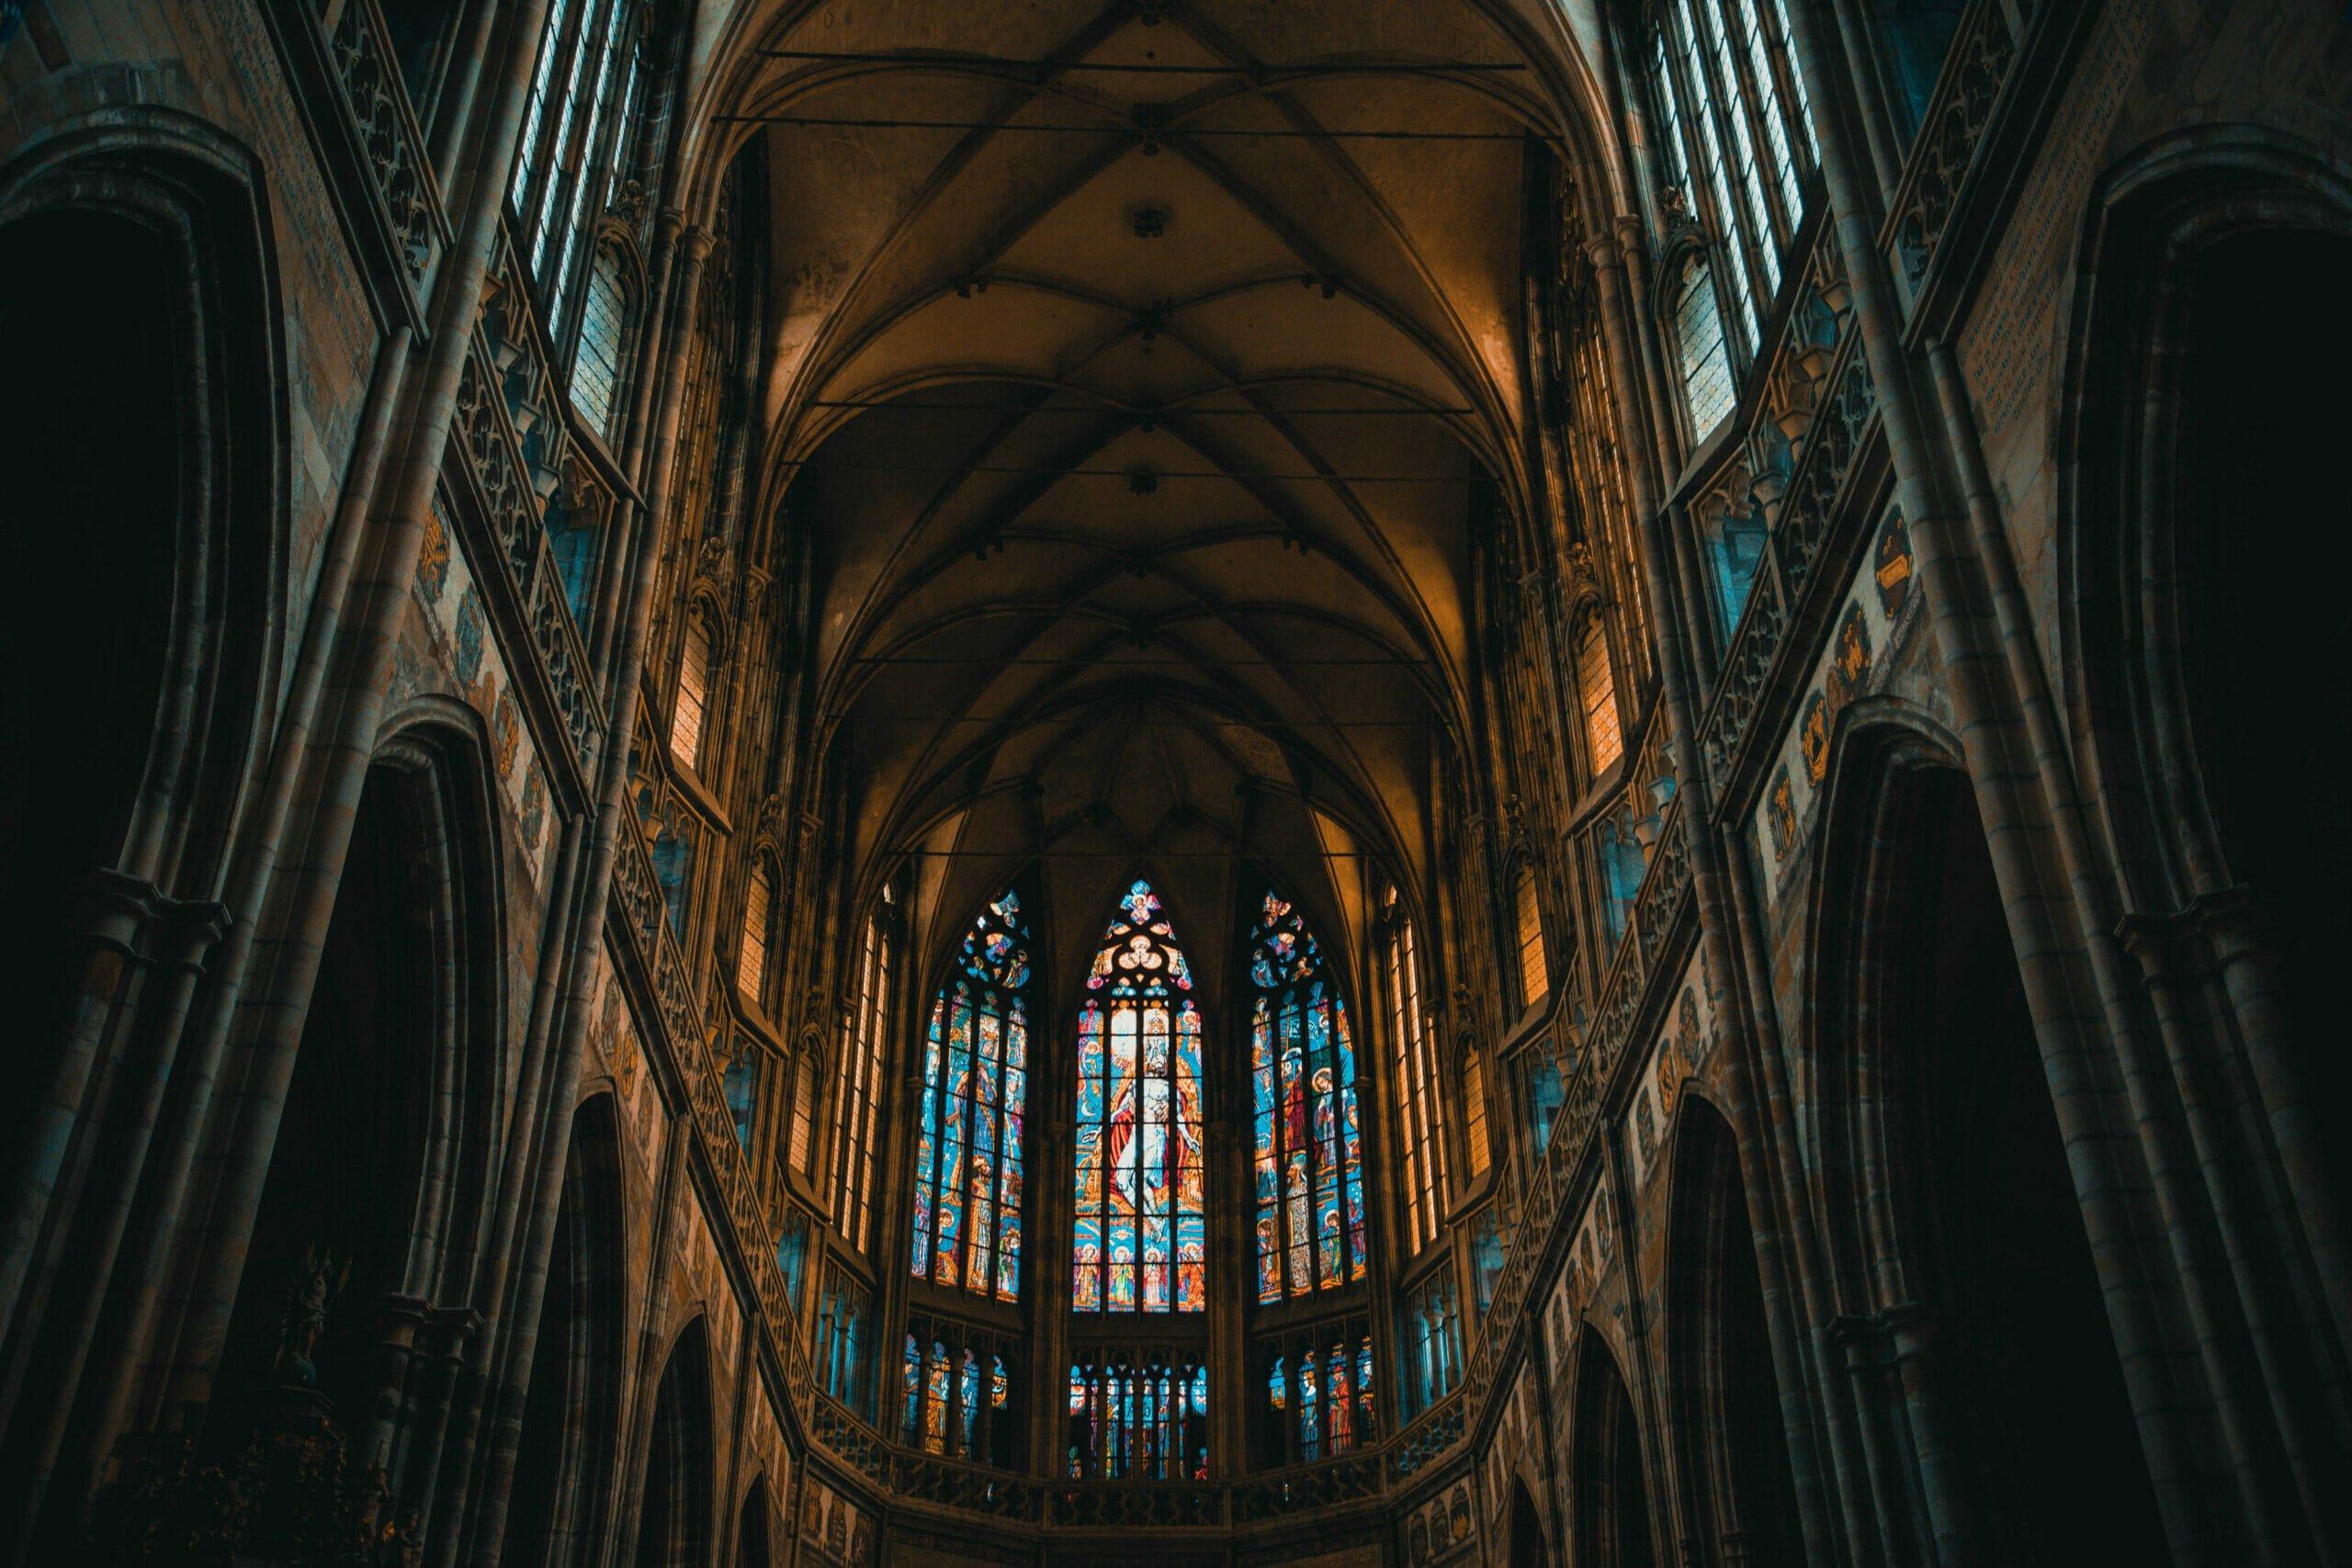 St. vitus cathedral_anthony-delanoix